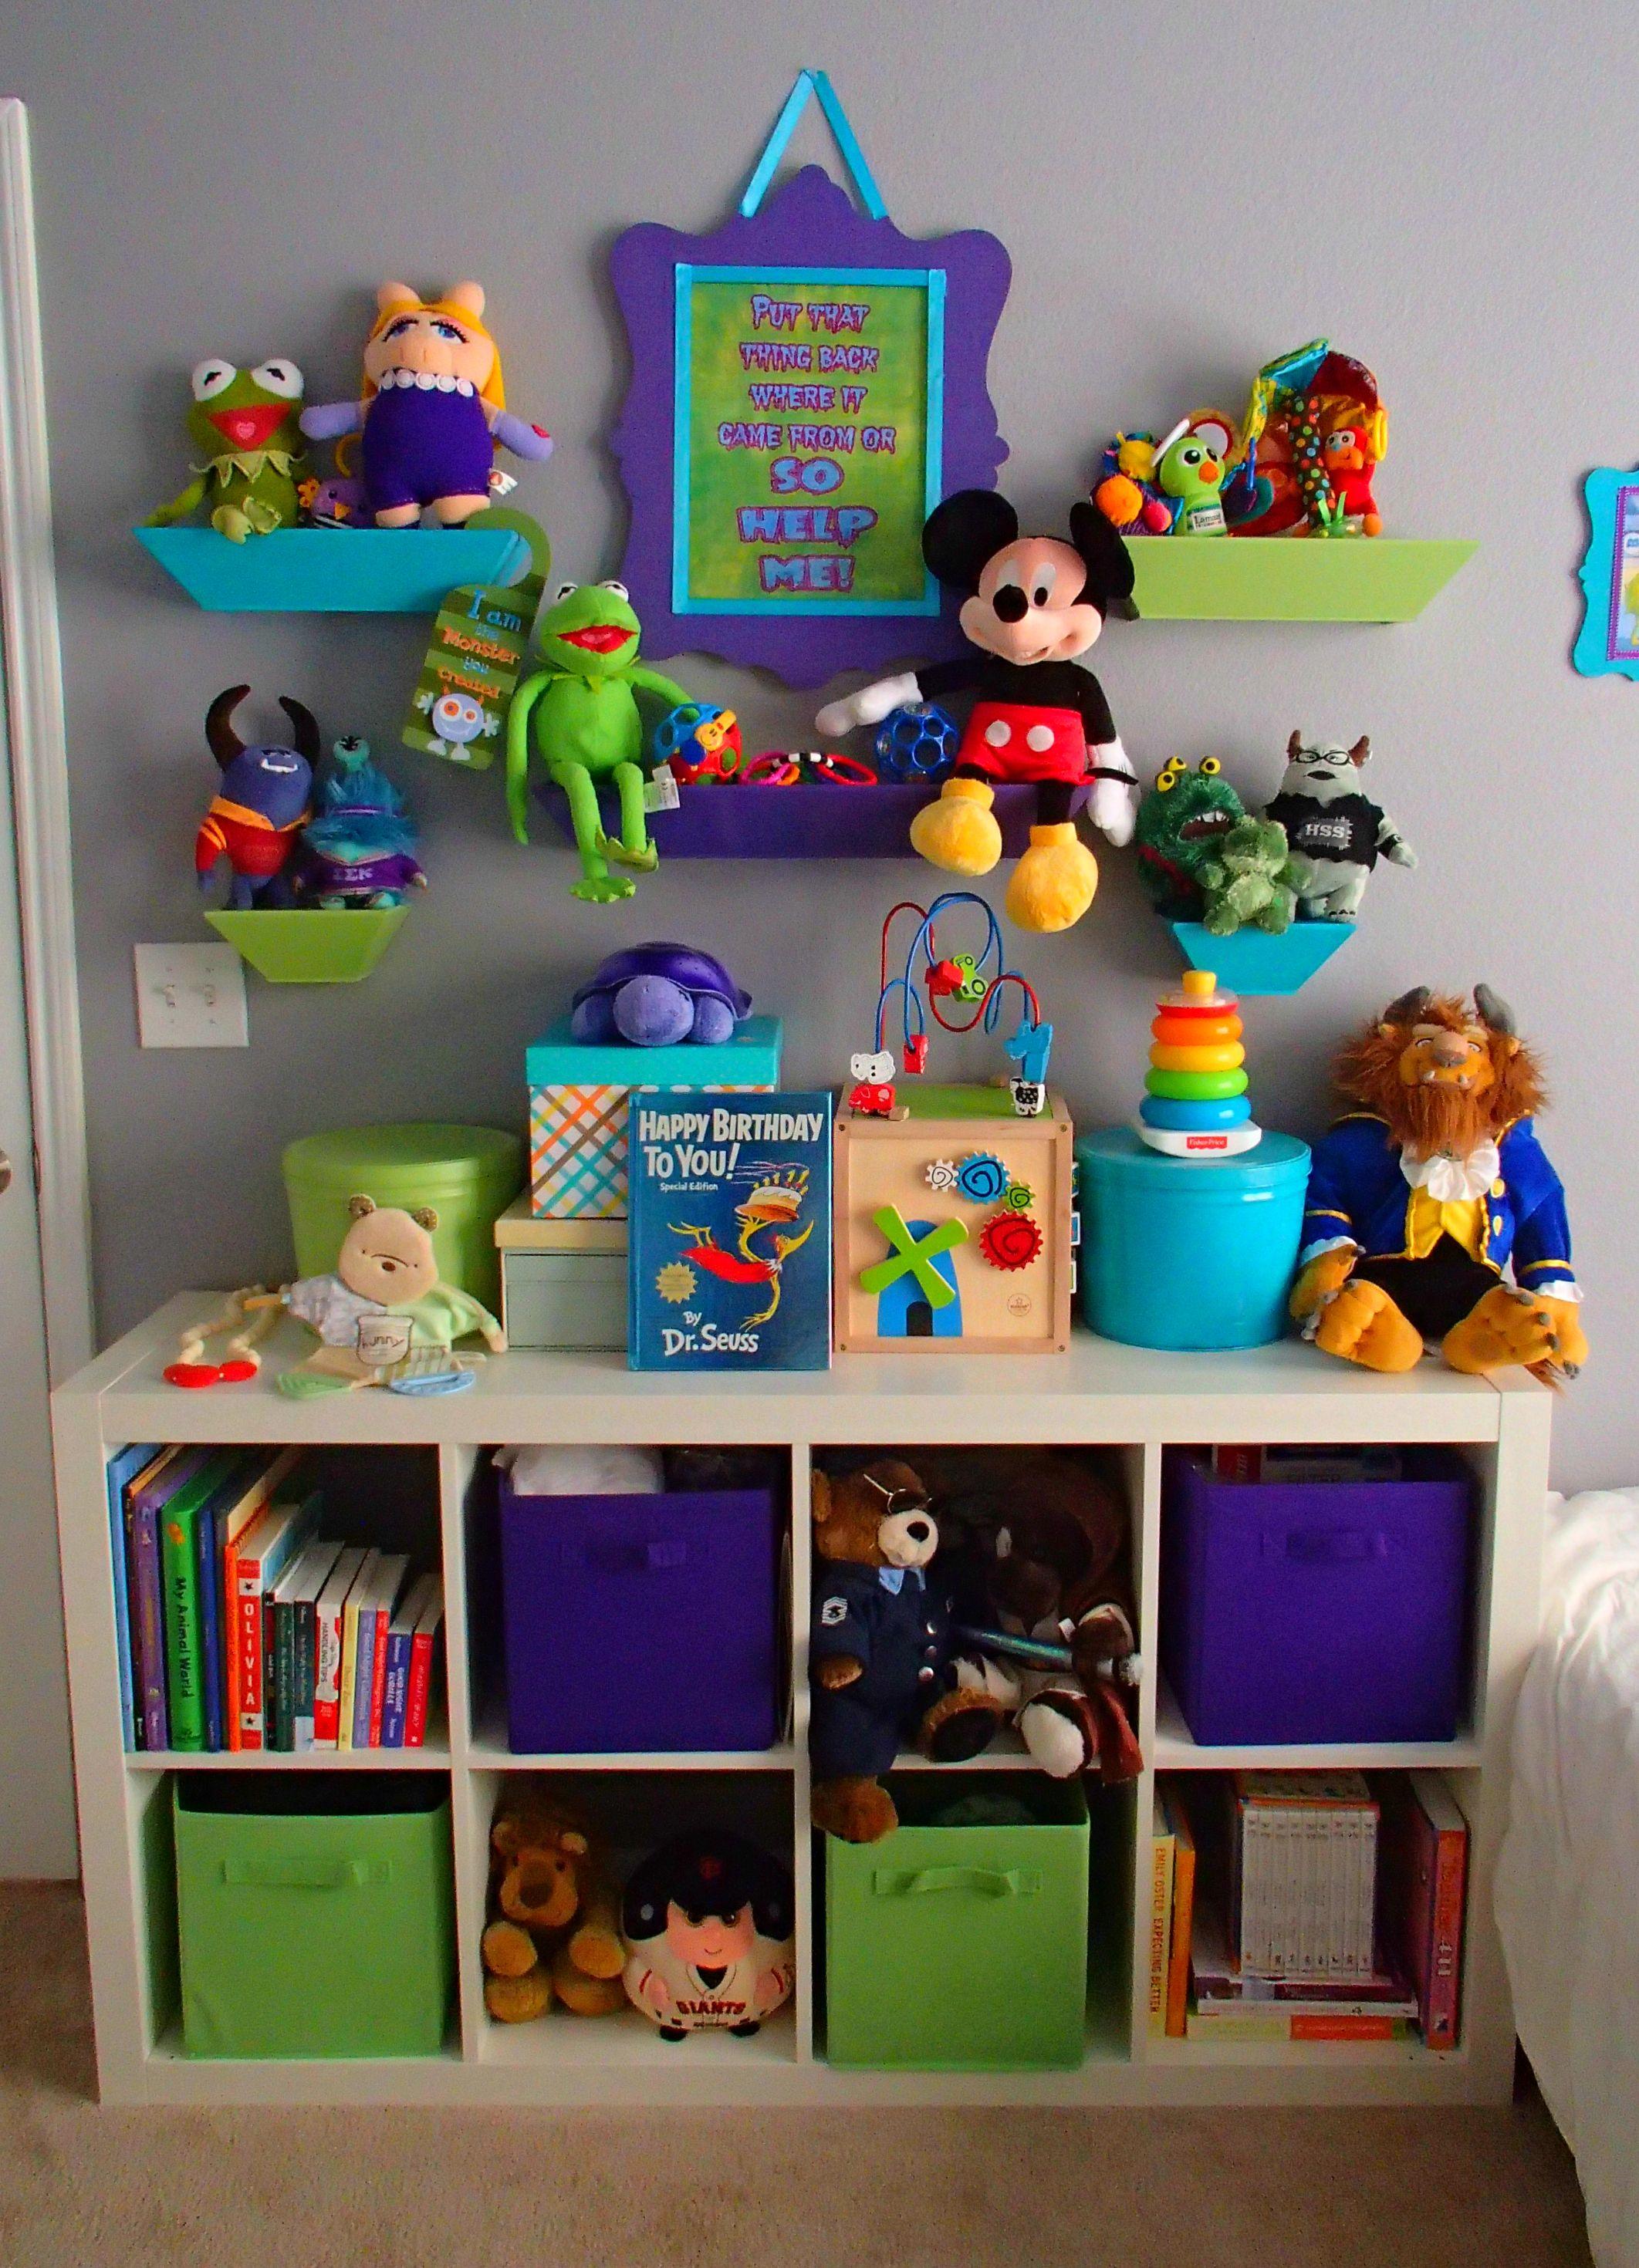 Pin By Kristina Koplinski Bautista On Kiddo Ideas Disney Baby Nurseries Toy Story Nursery Toy Story Room